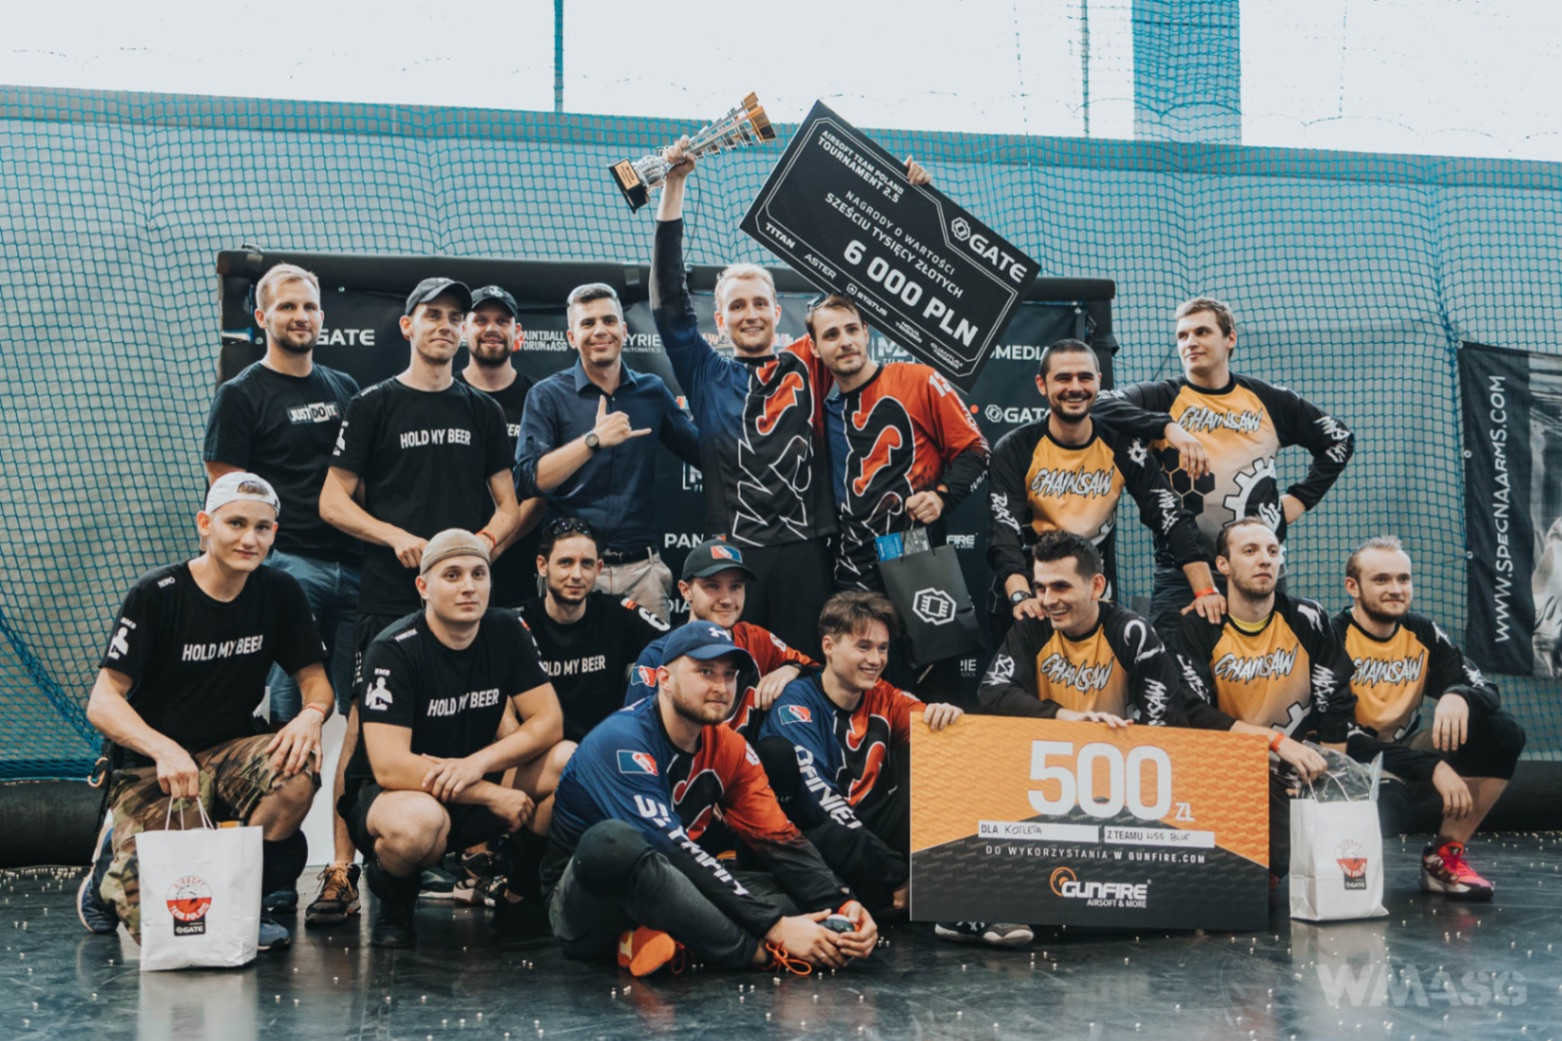 Airsoft Team Poland Tournament 2.5 No Pressure - the Beginning